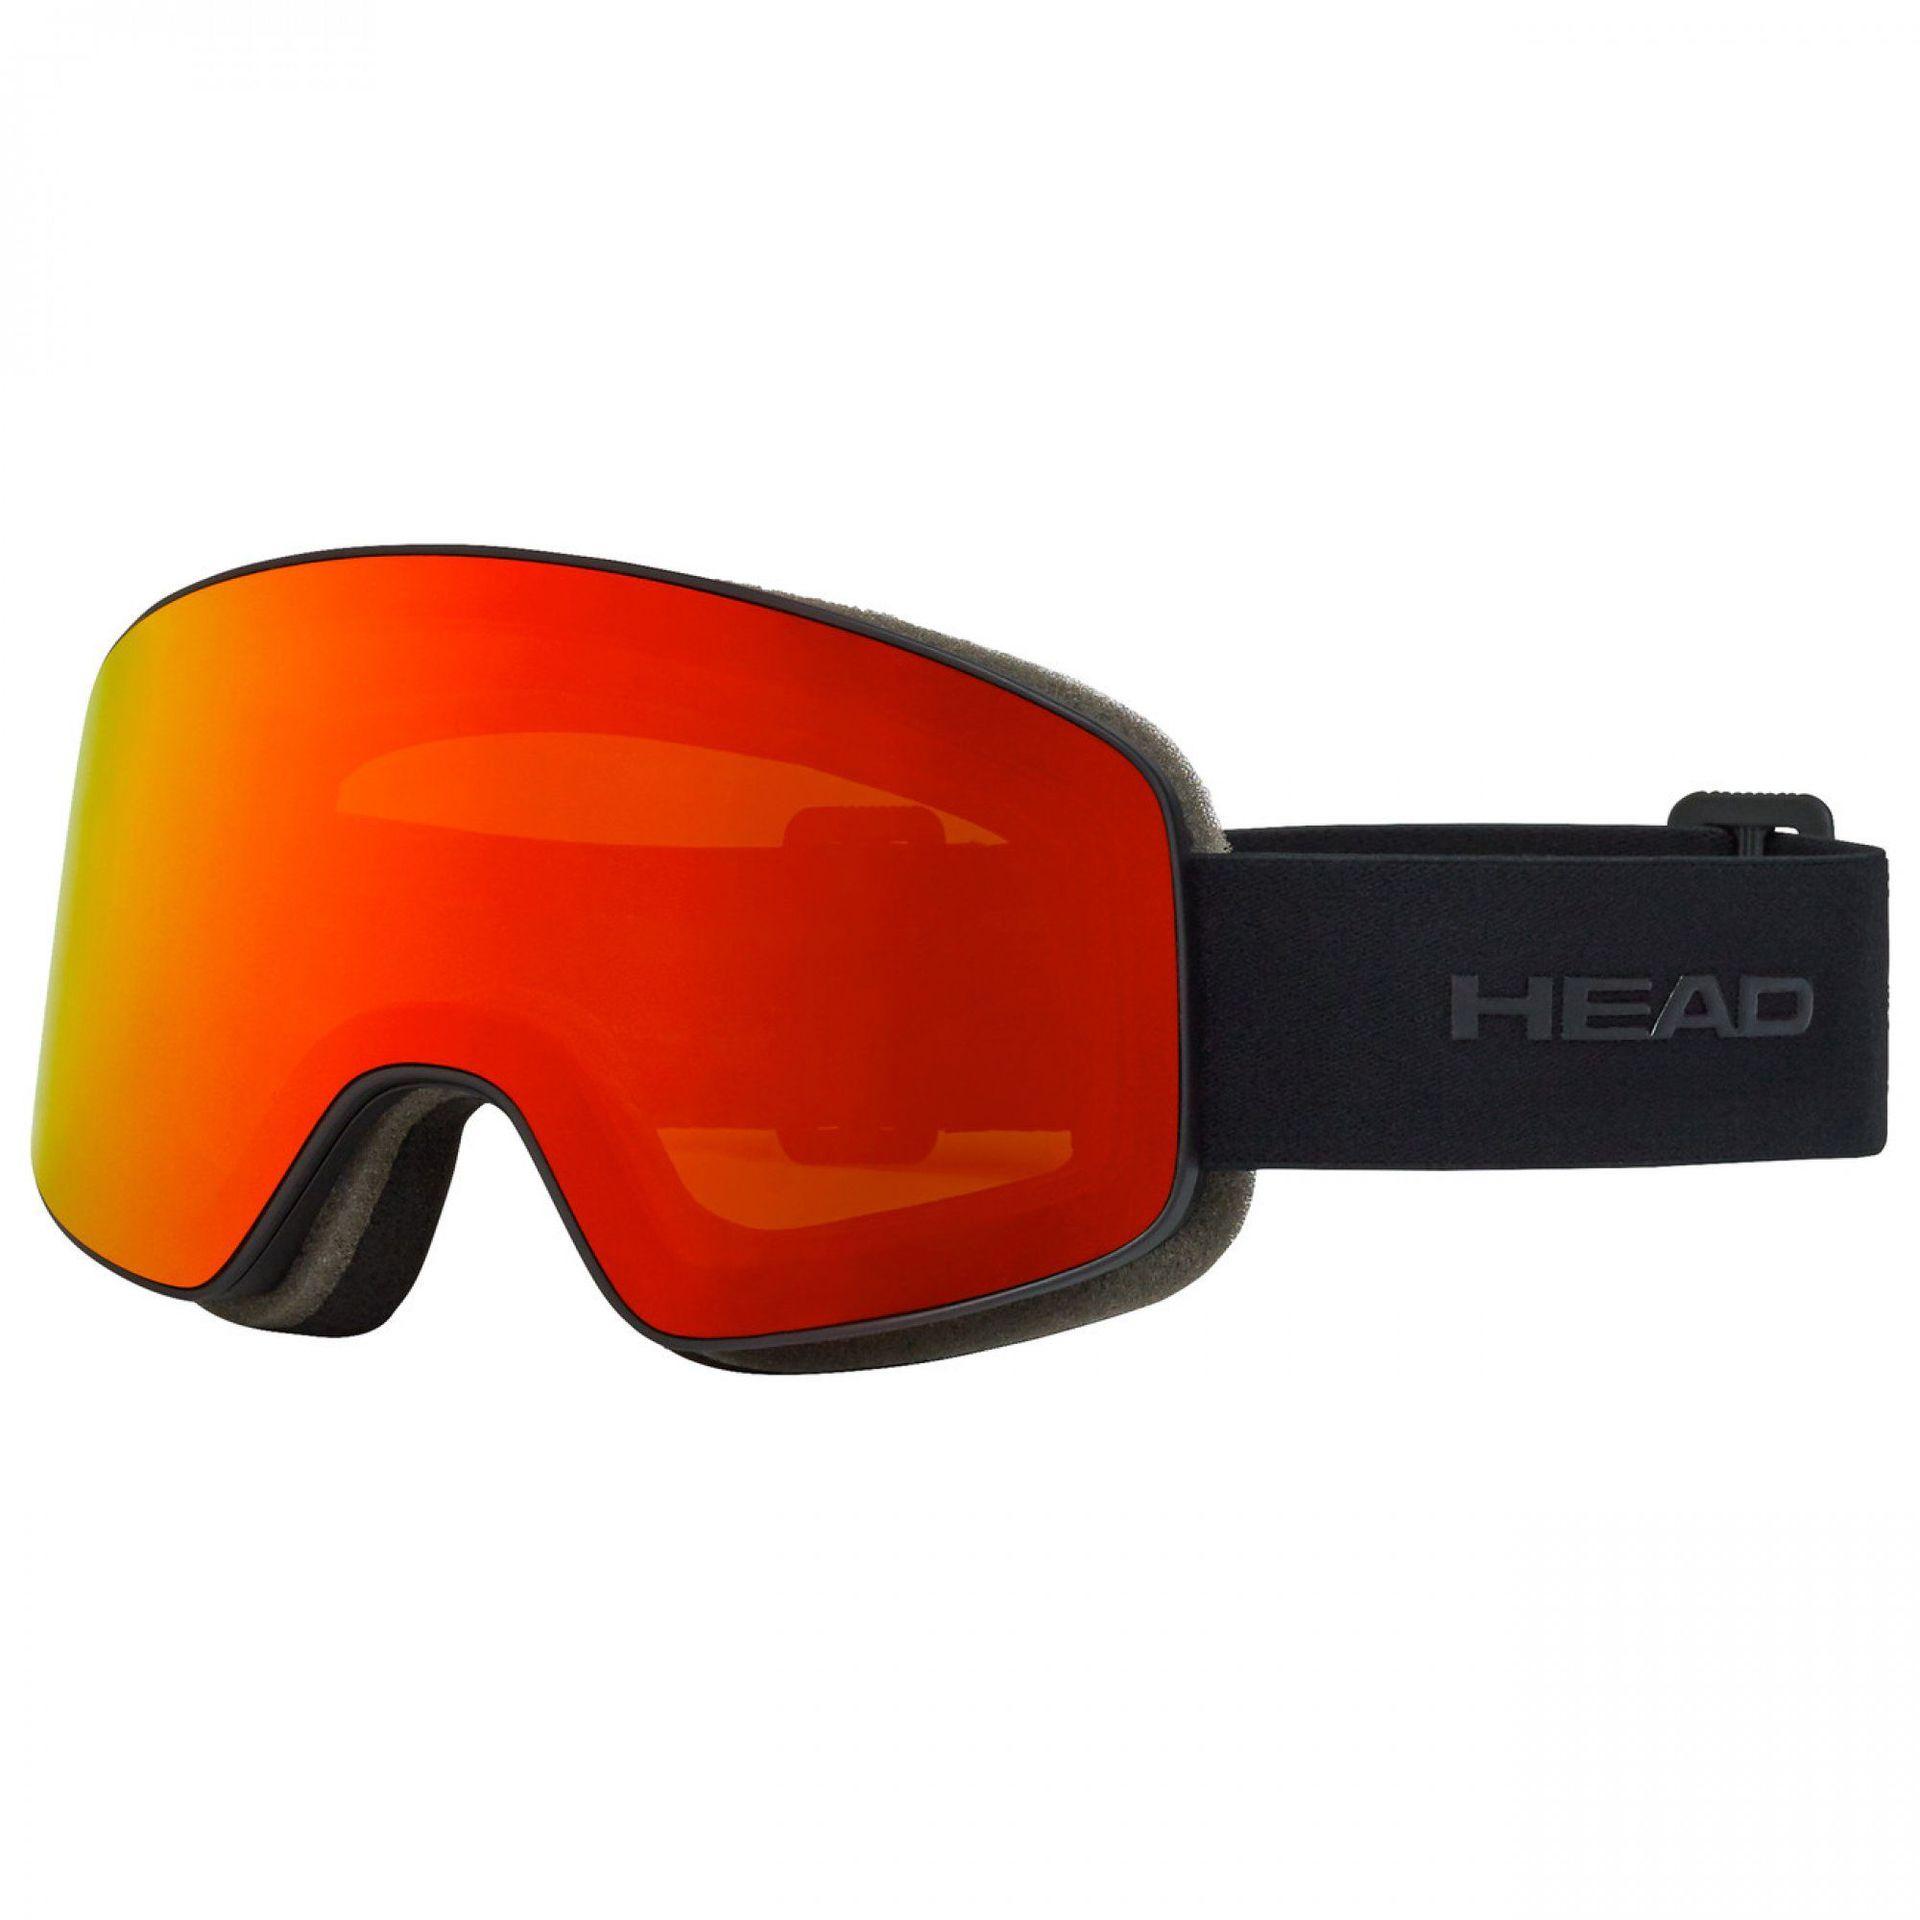 GOGLE HEAD HORIZON FMR 391208